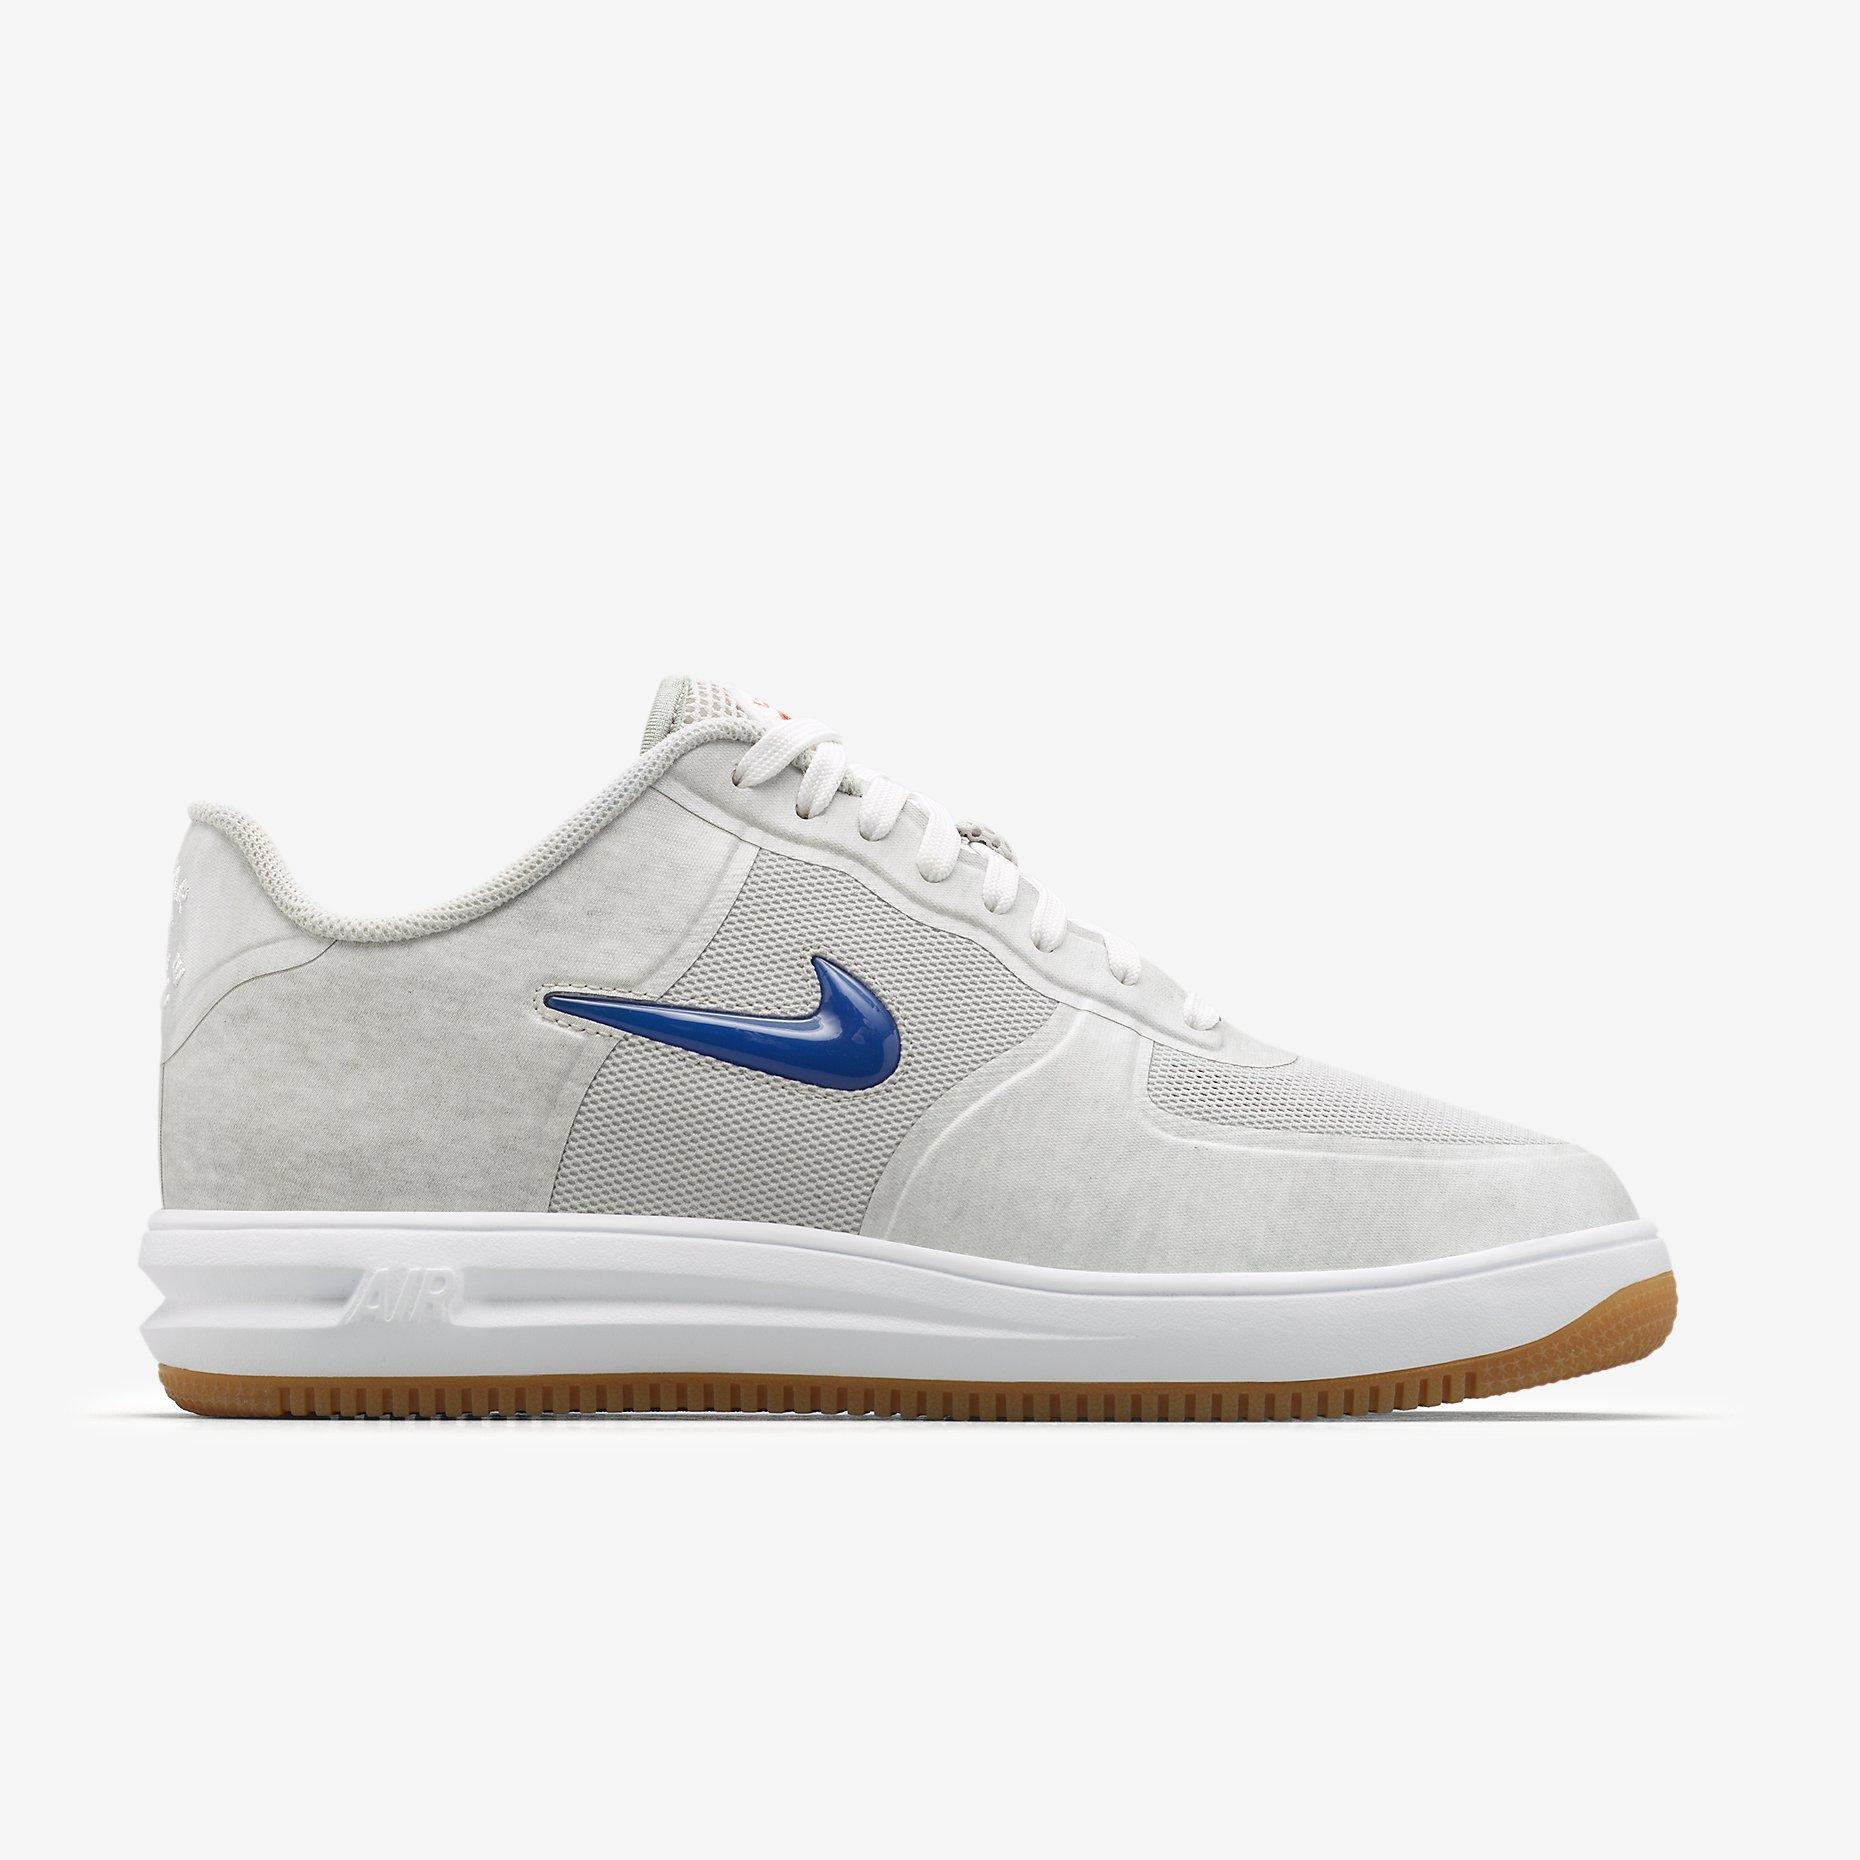 Nike x CLOT Lunar Force 1 Sneaker